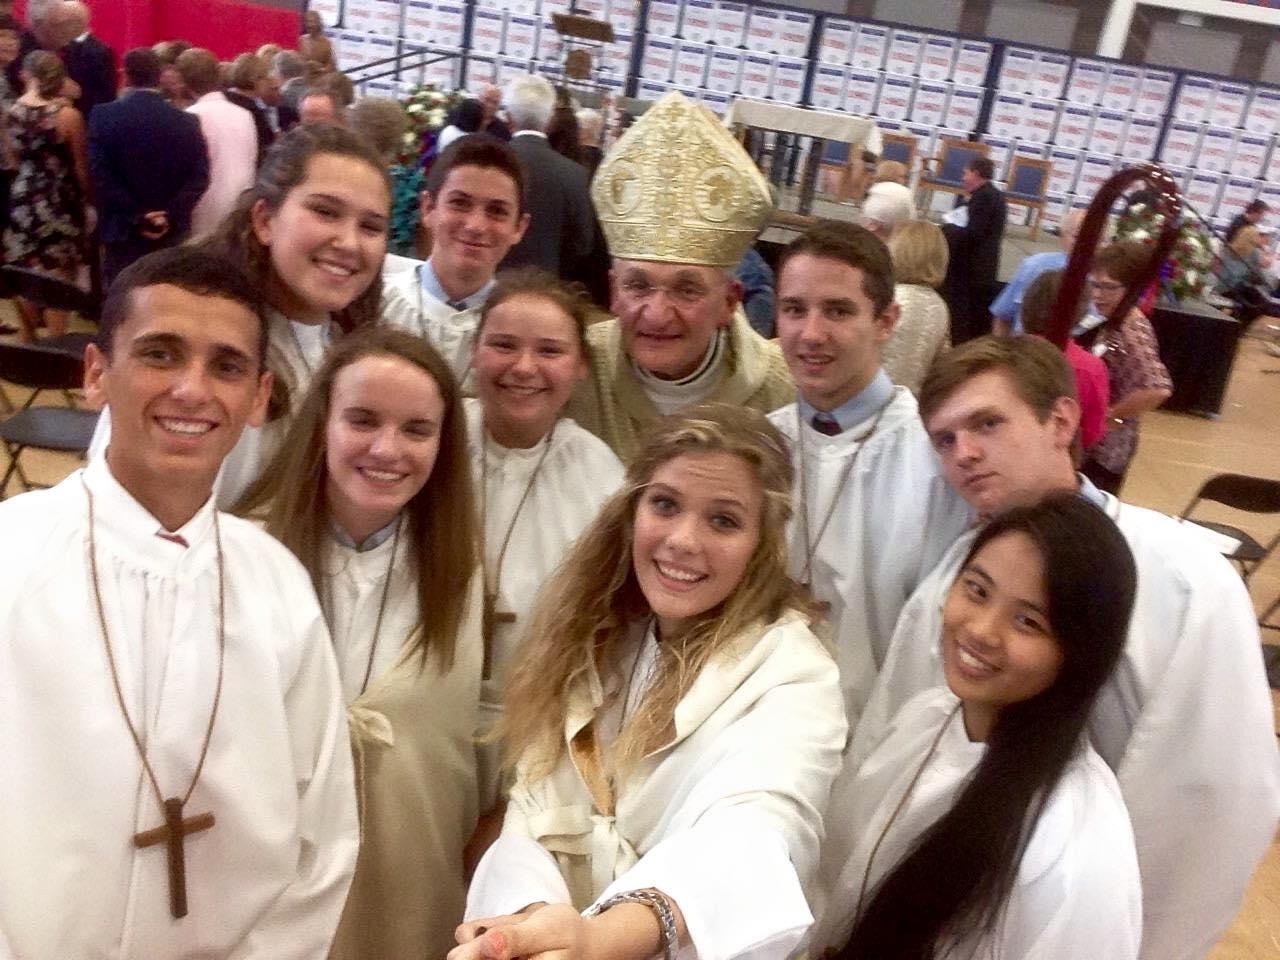 sjhs-altar-servers-selfie-091315